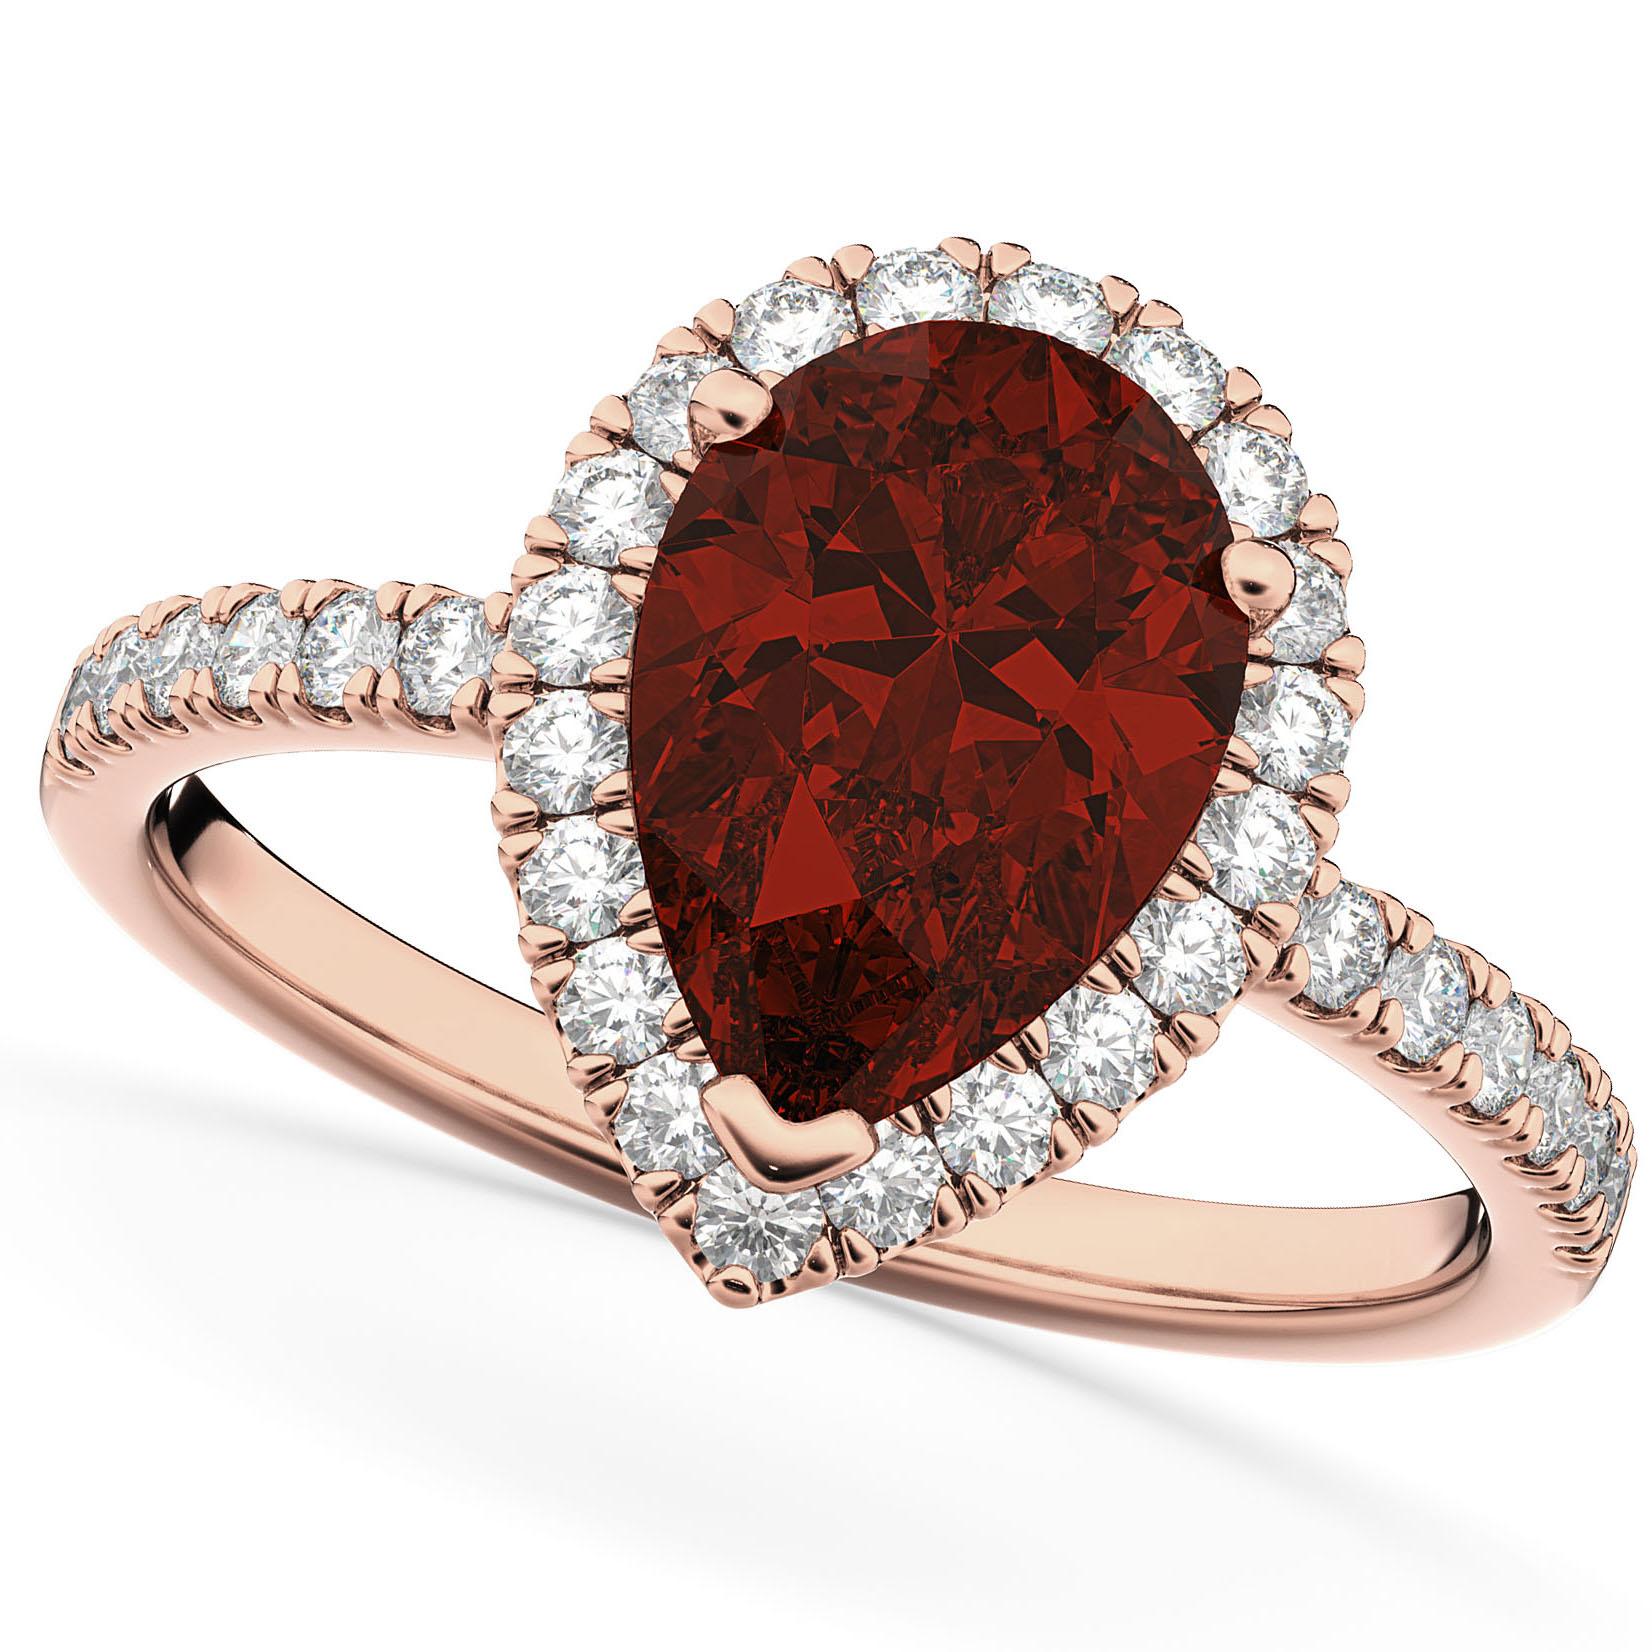 Pear Cut Halo Garnet & Diamond Engagement Ring 14K Rose Gold 2.31ct